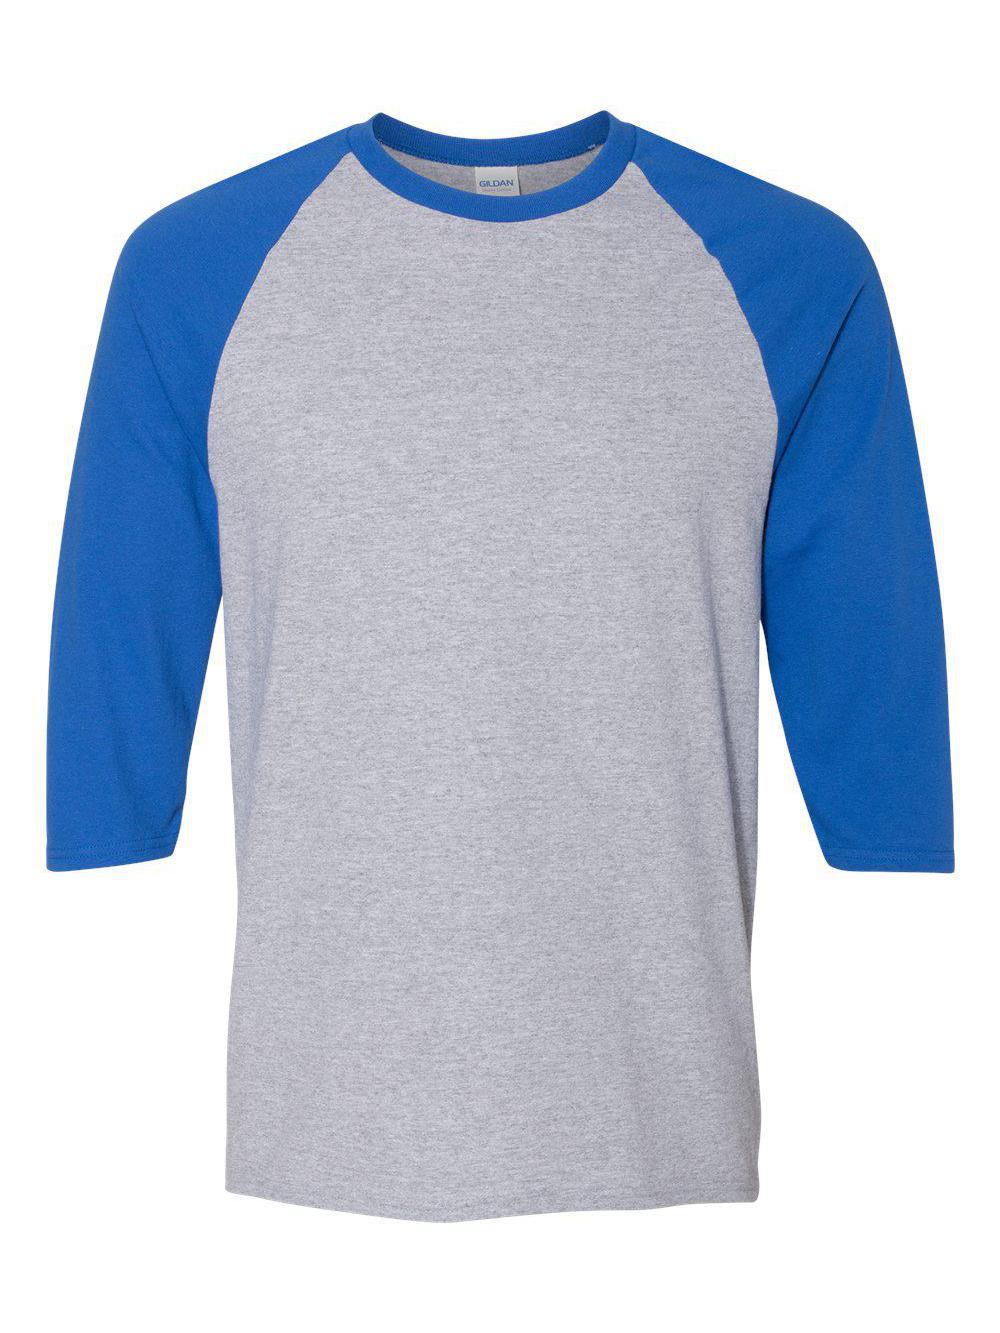 Gildan-Heavy-Cotton-Three-Quarter-Raglan-Sleeve-Baseball-T-Shirt-5700 thumbnail 15